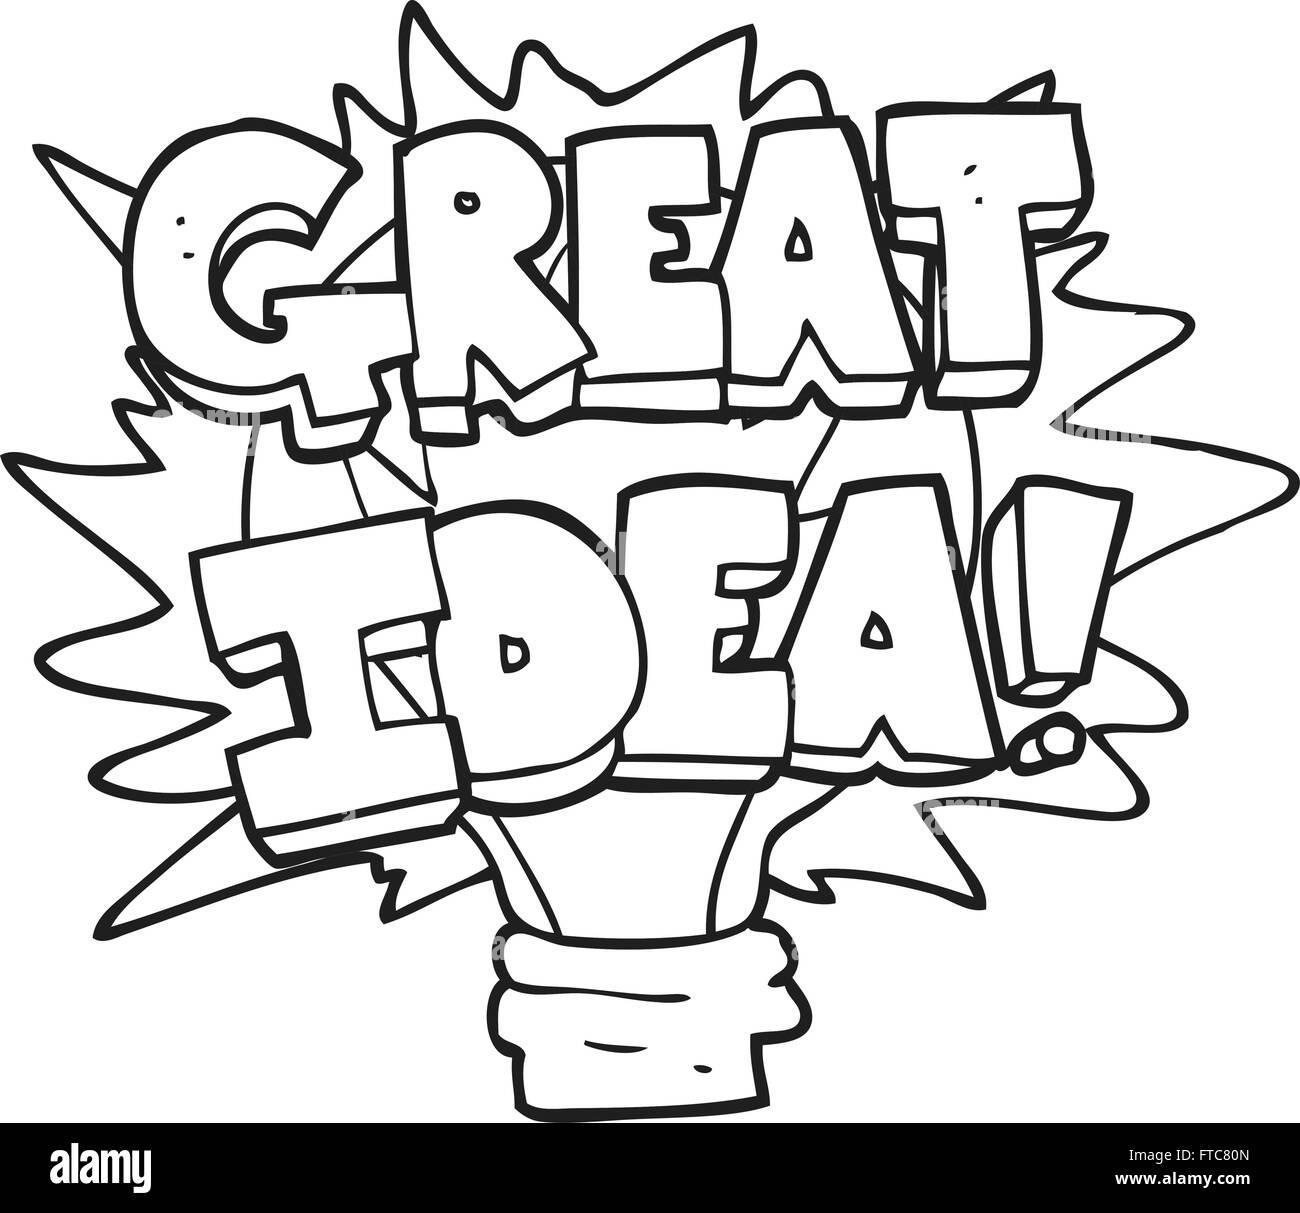 freehand drawn black and white cartoon great idea light bulb symbol ...